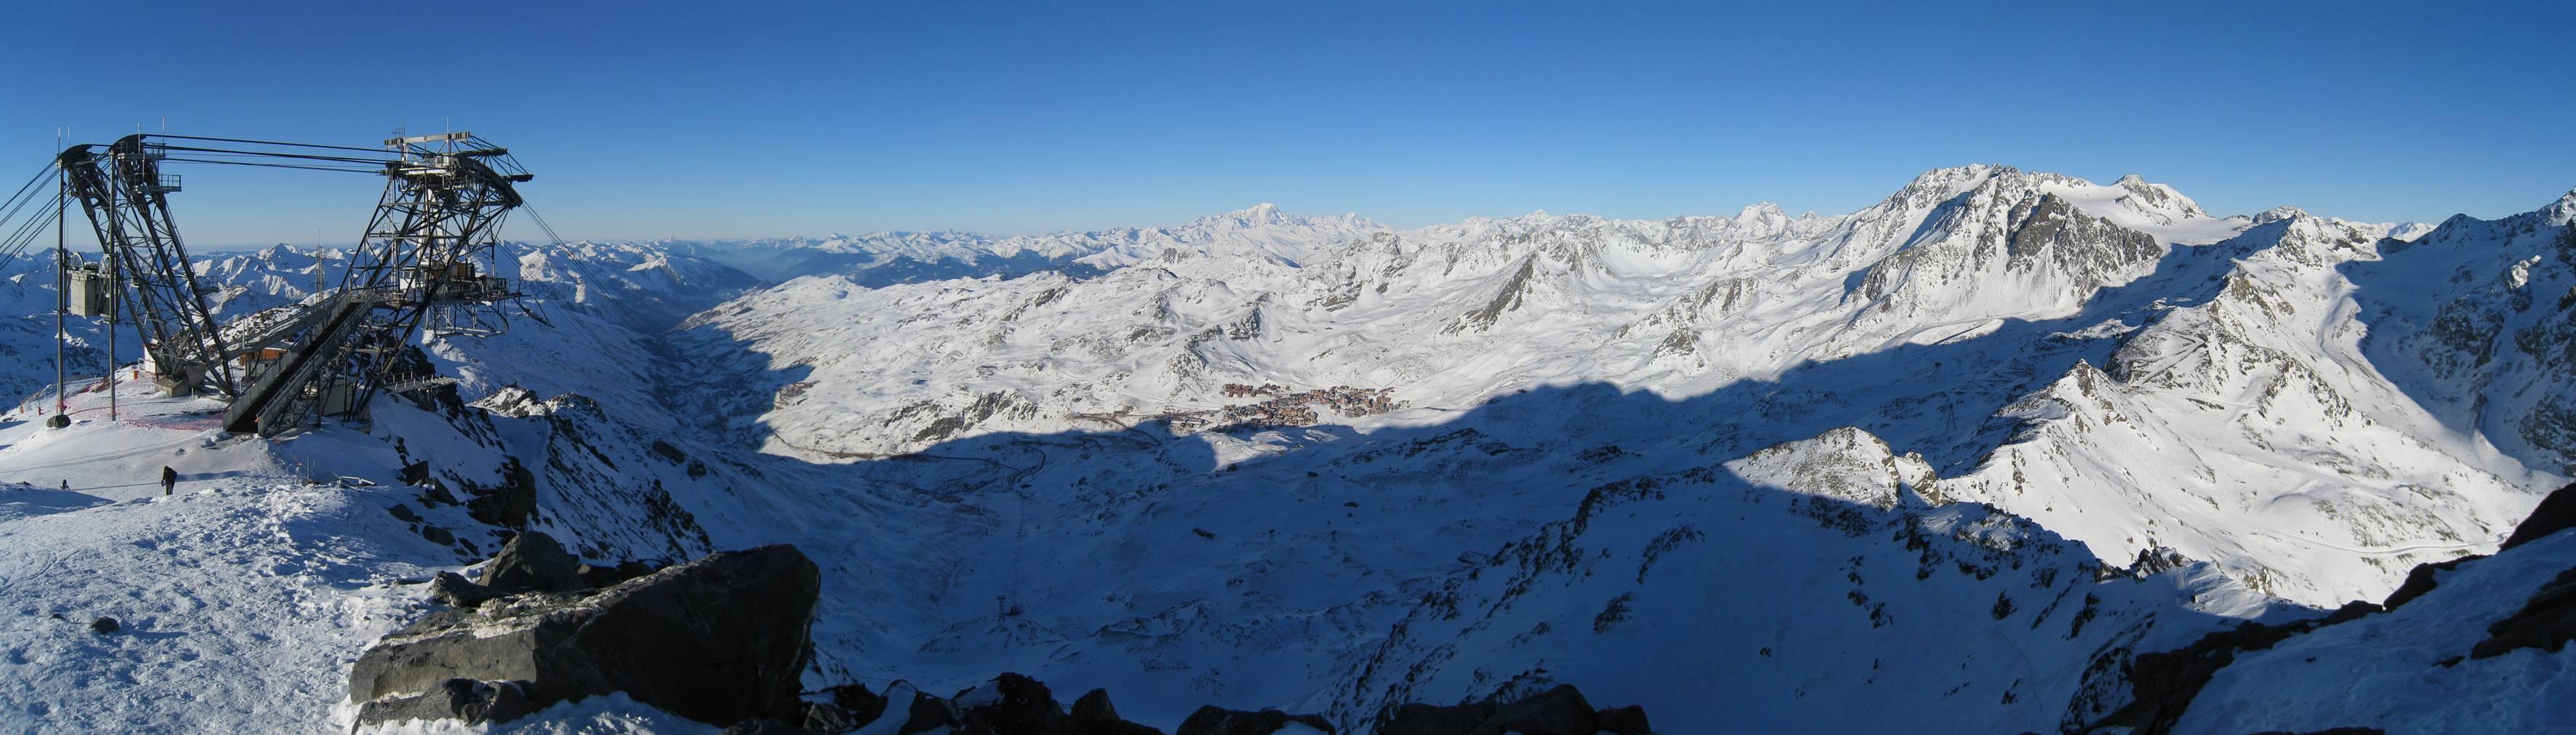 Val Thorens podniebna stacja narciarska